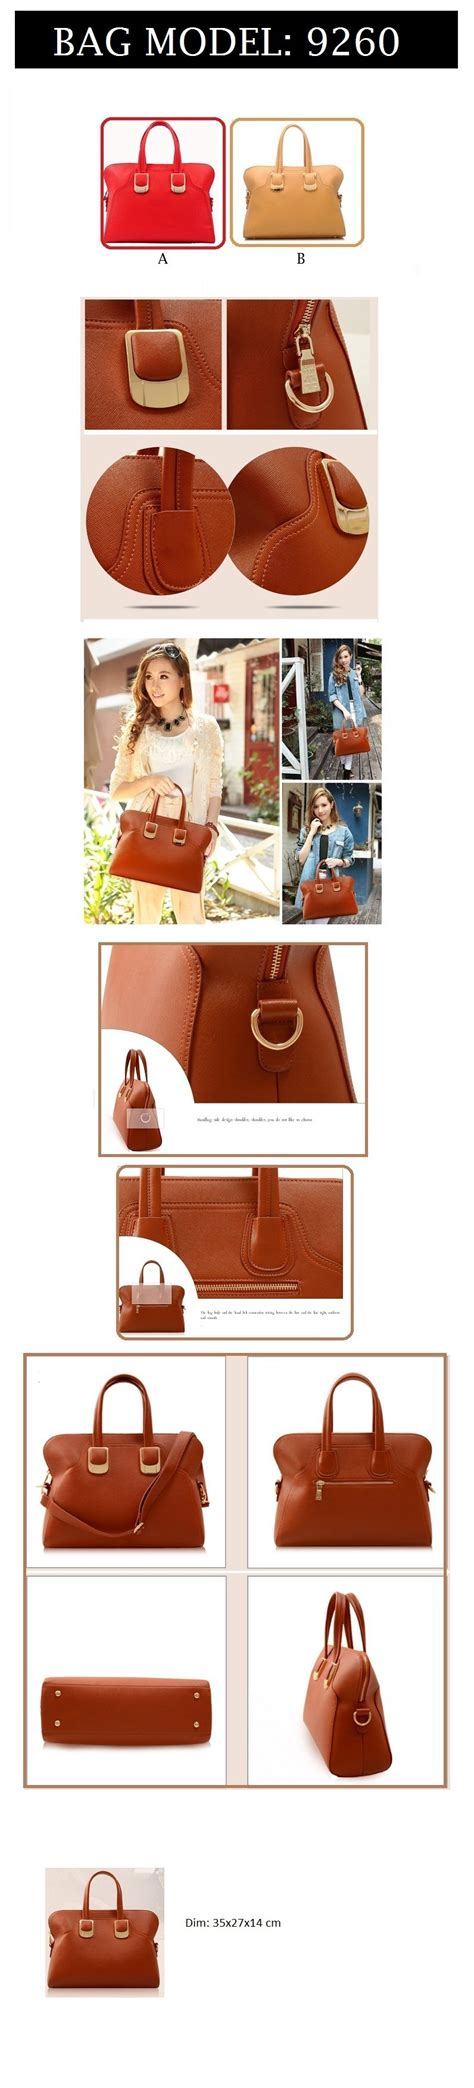 Bag Korea Po 40 whuffle medium assorted bags korean taiwan tote classic bag work bag premium pu